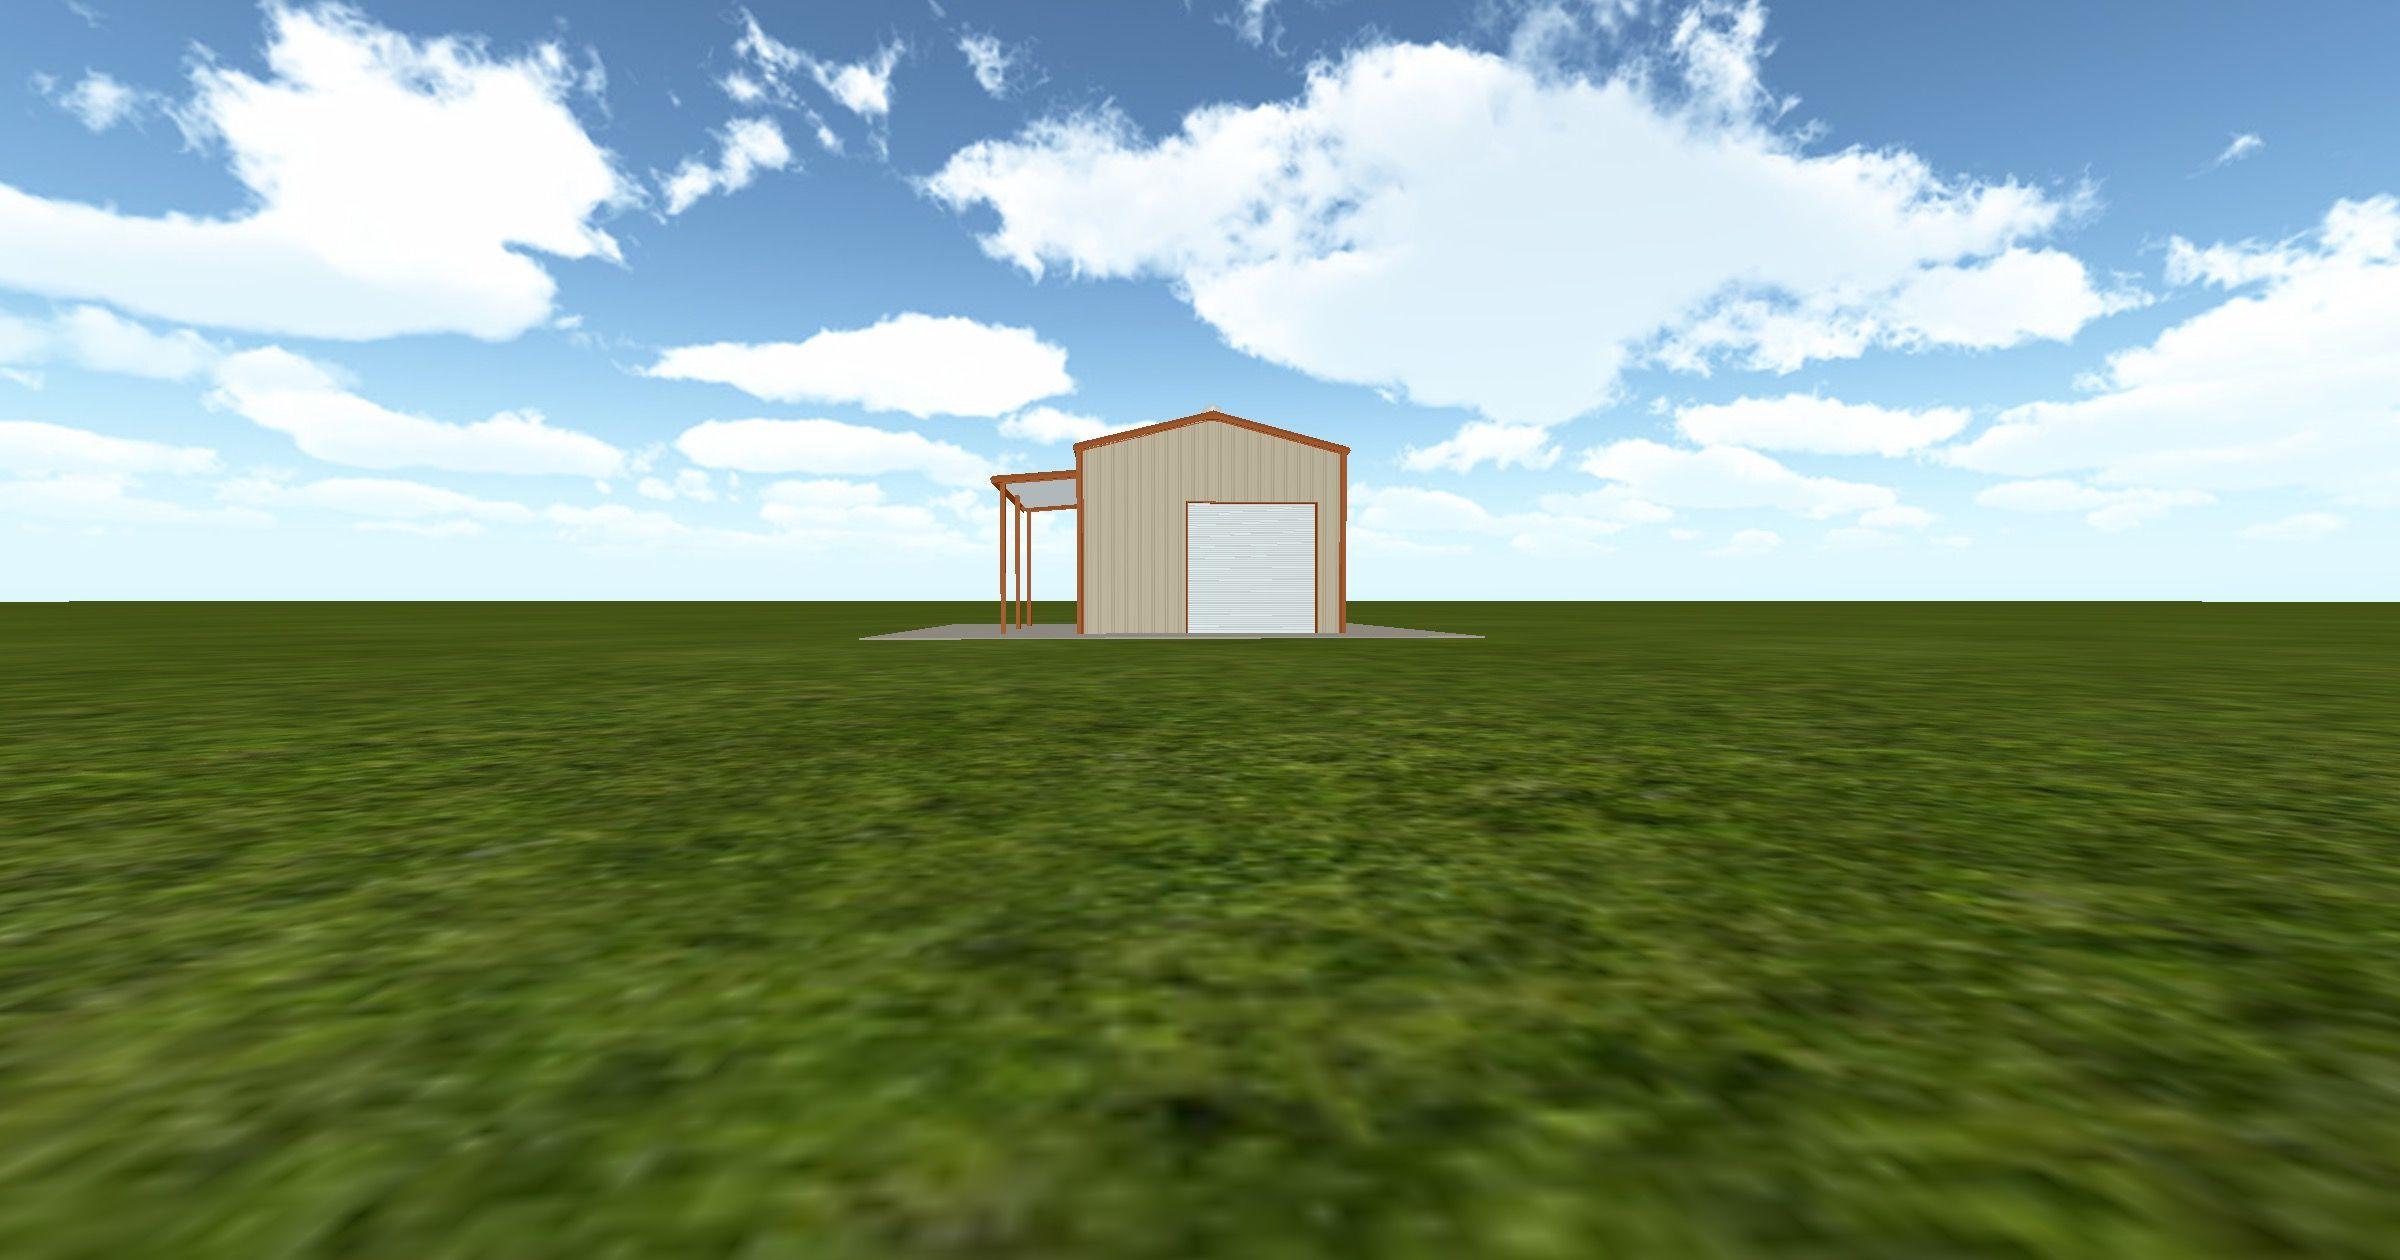 Cool 3D #marketing http://ift.tt/29mCZ51 #barn #workshop #greenhouse #garage #roofing #DIY